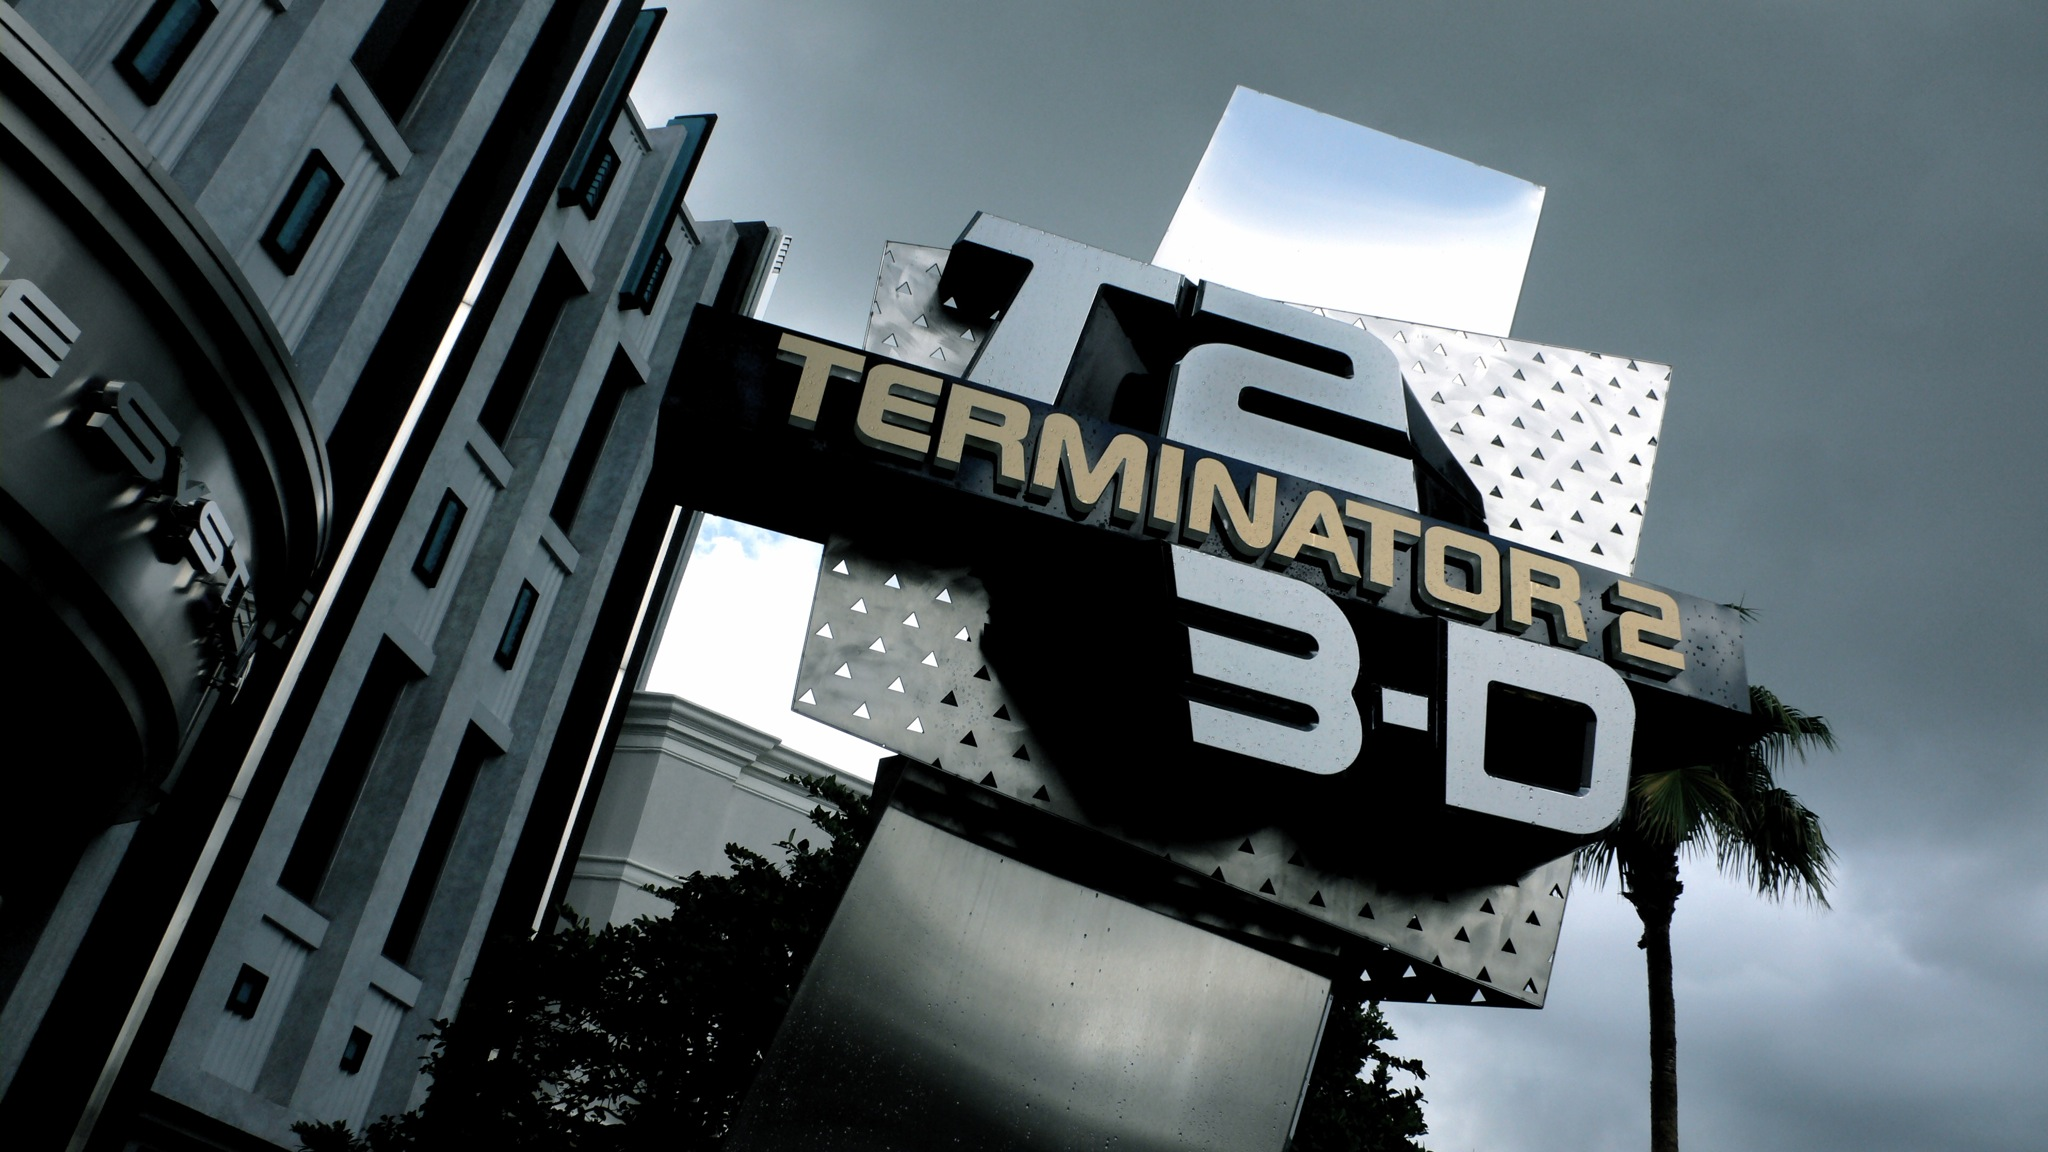 file terminator 2 3d entrance universal studios florida jpg